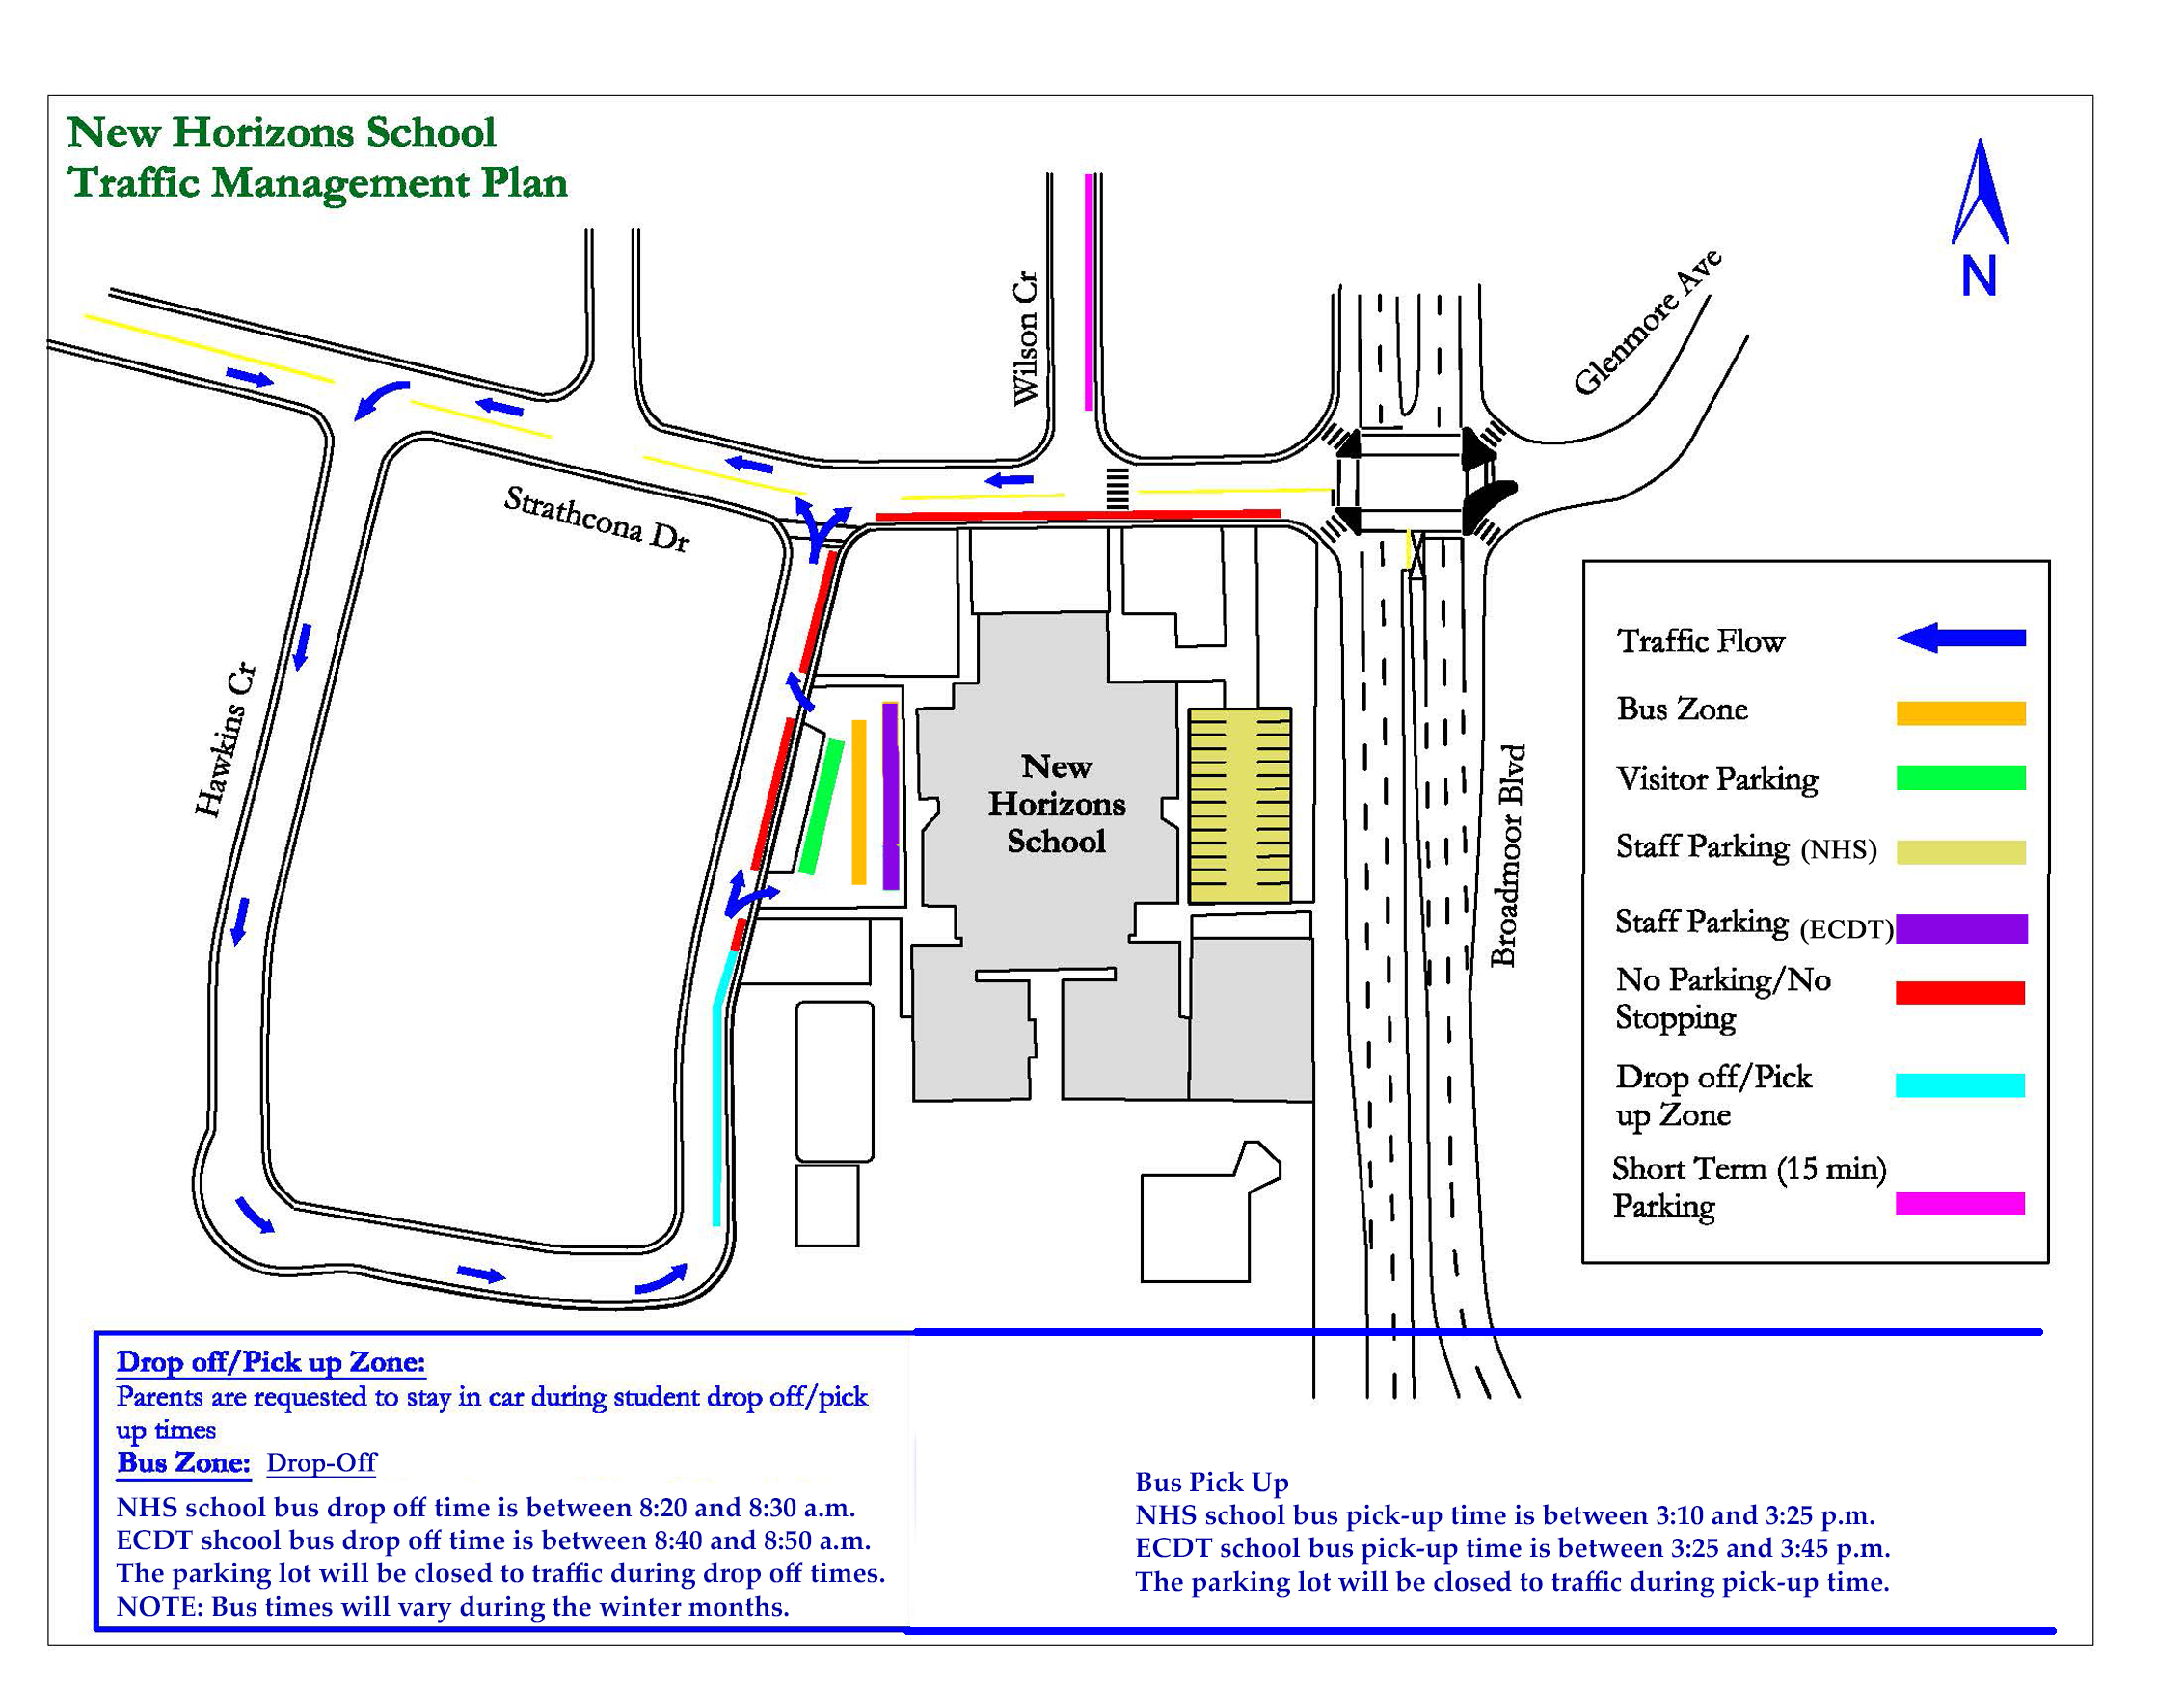 New Horizon School Traffic Control August 26 - New Horizons